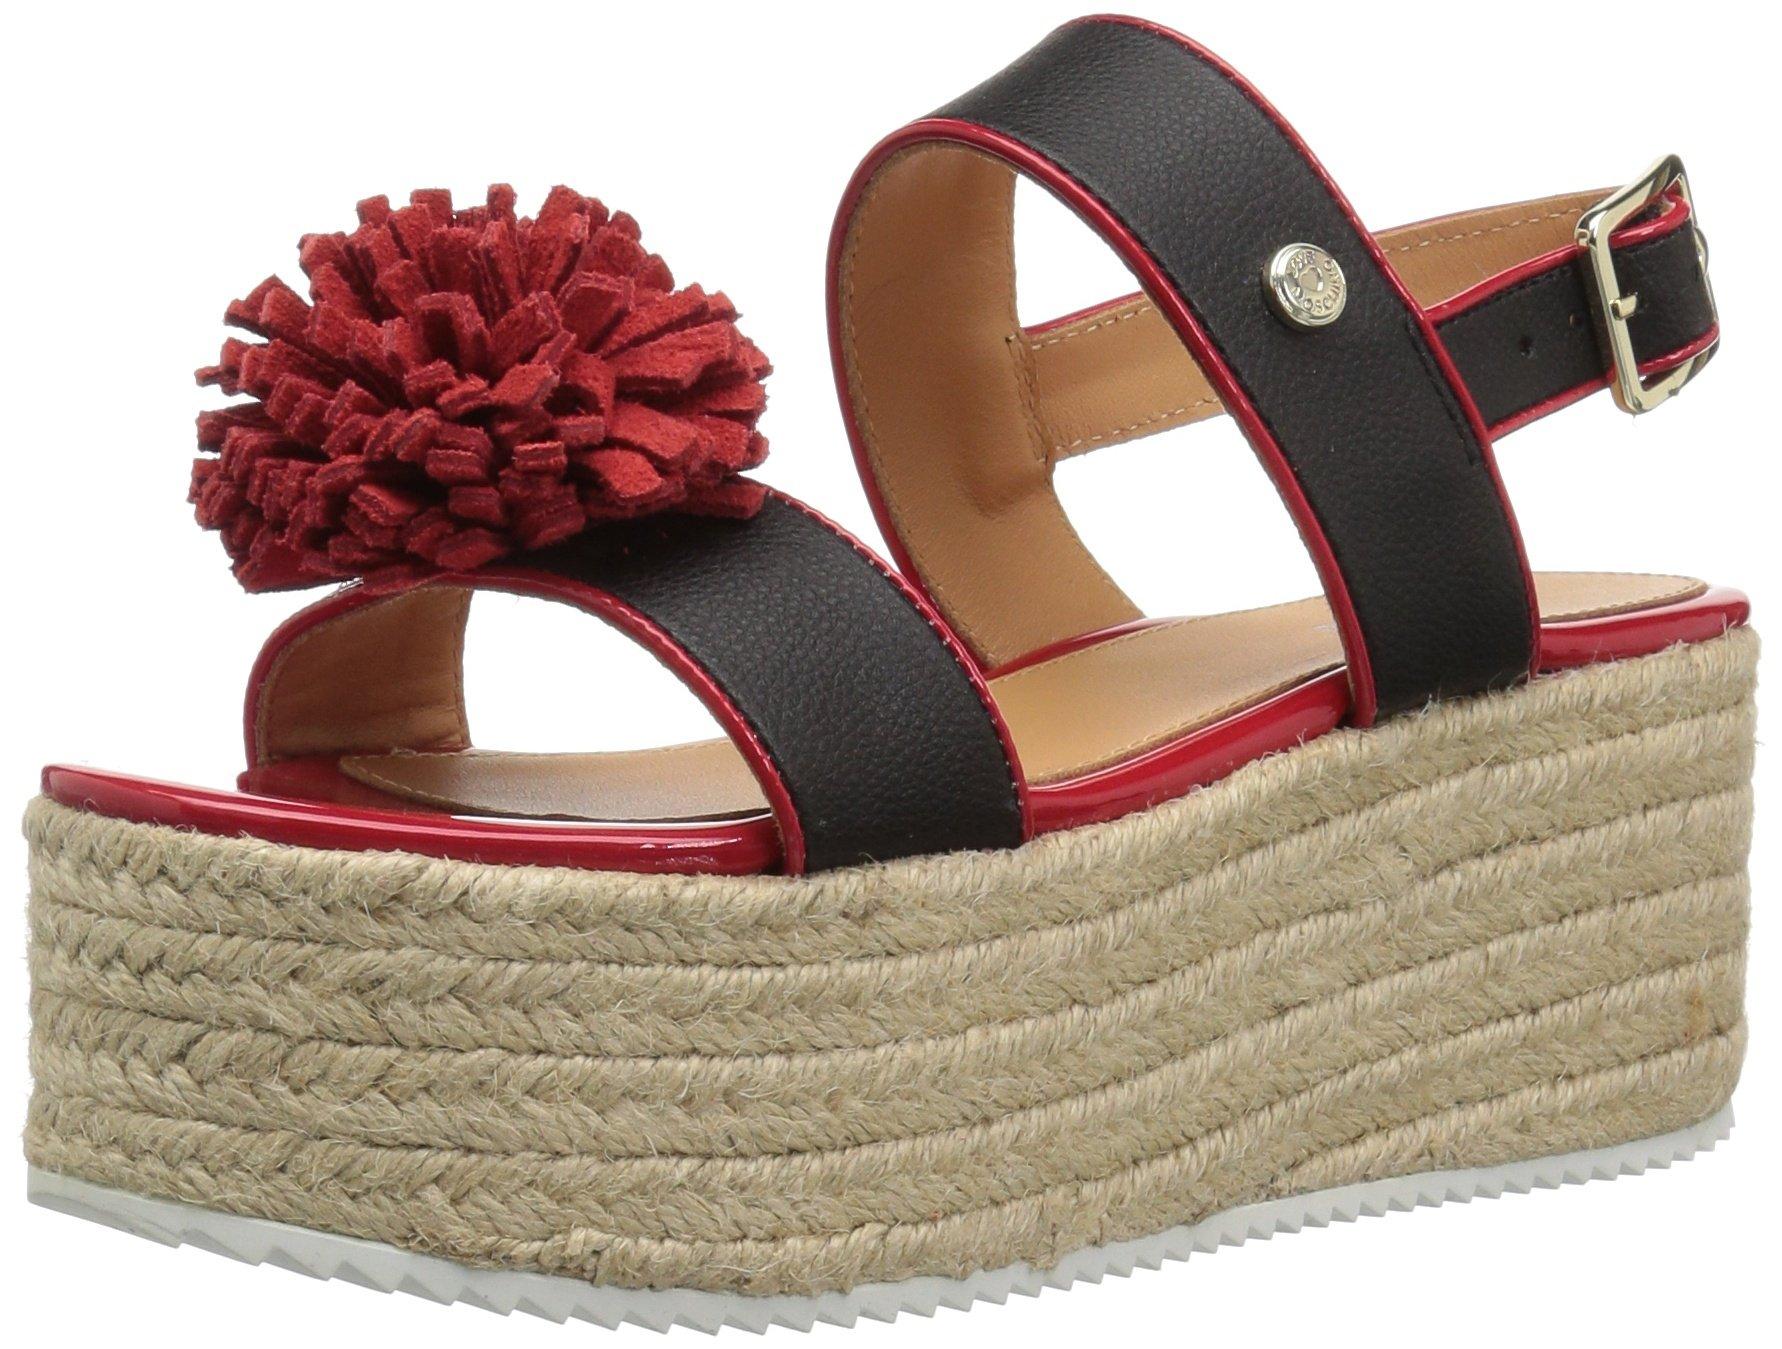 Love Moschino Women's JA16107I15ID100A Sneaker, Black/Red, 39 M EU (8 US)